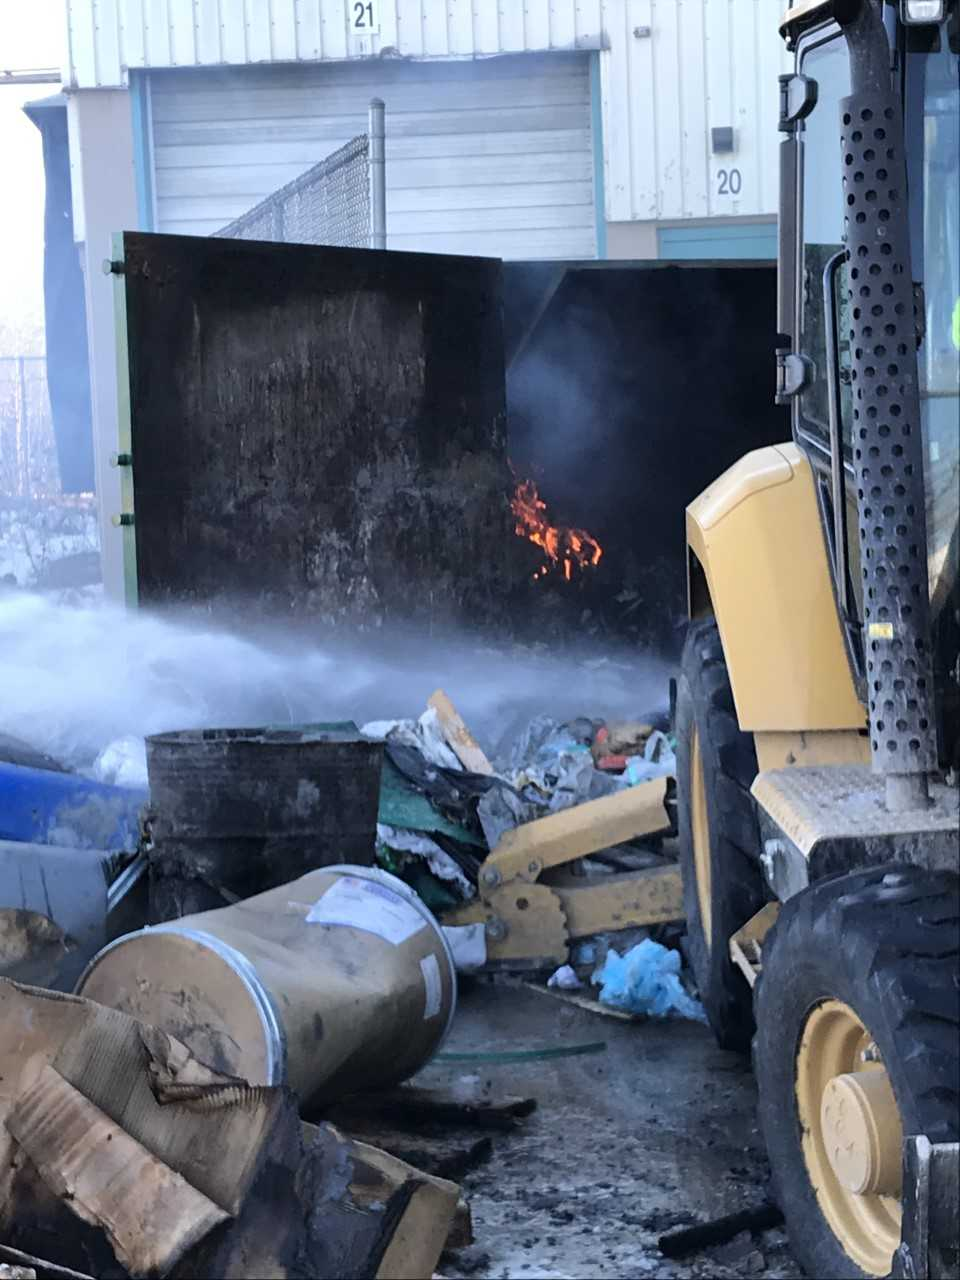 Dumpster Fire_1544140569377.jpg.jpg